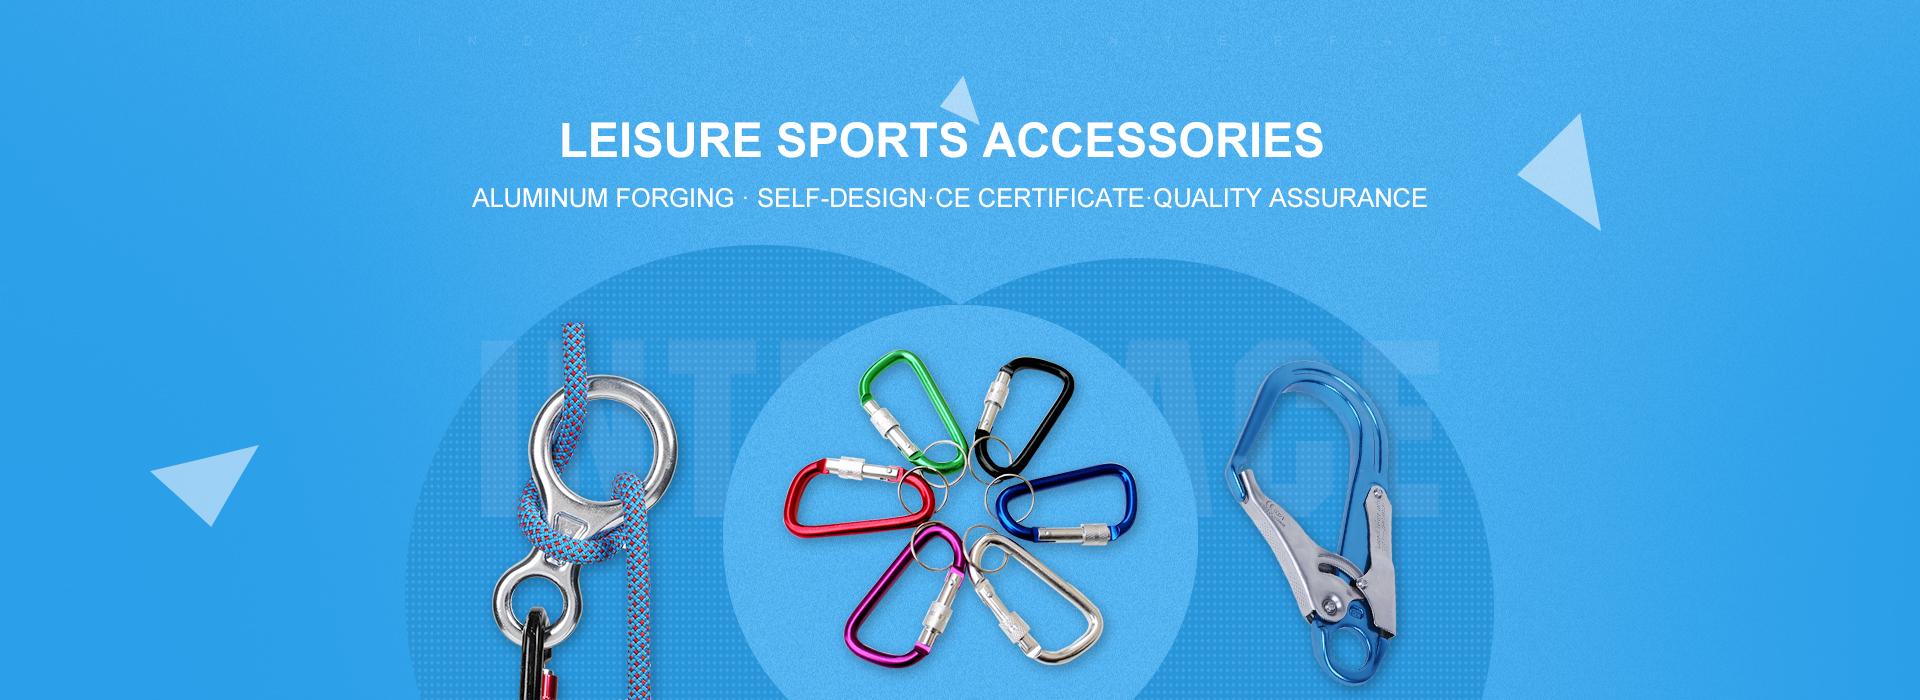 Leisure Sports Accessories